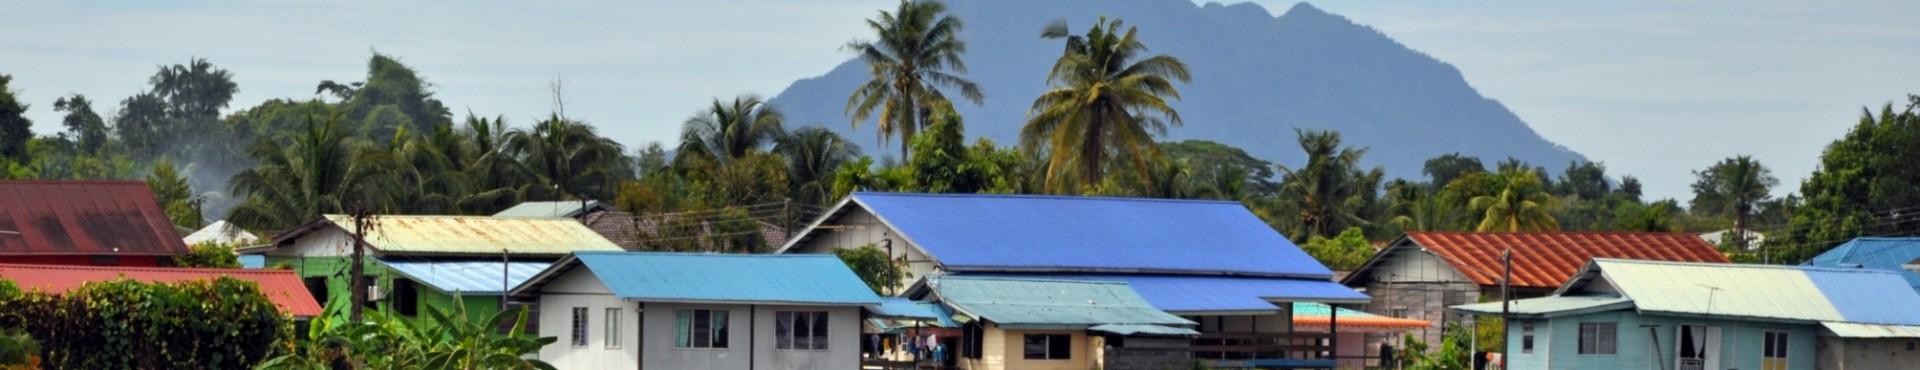 Sarawak, Borneo malese 2013